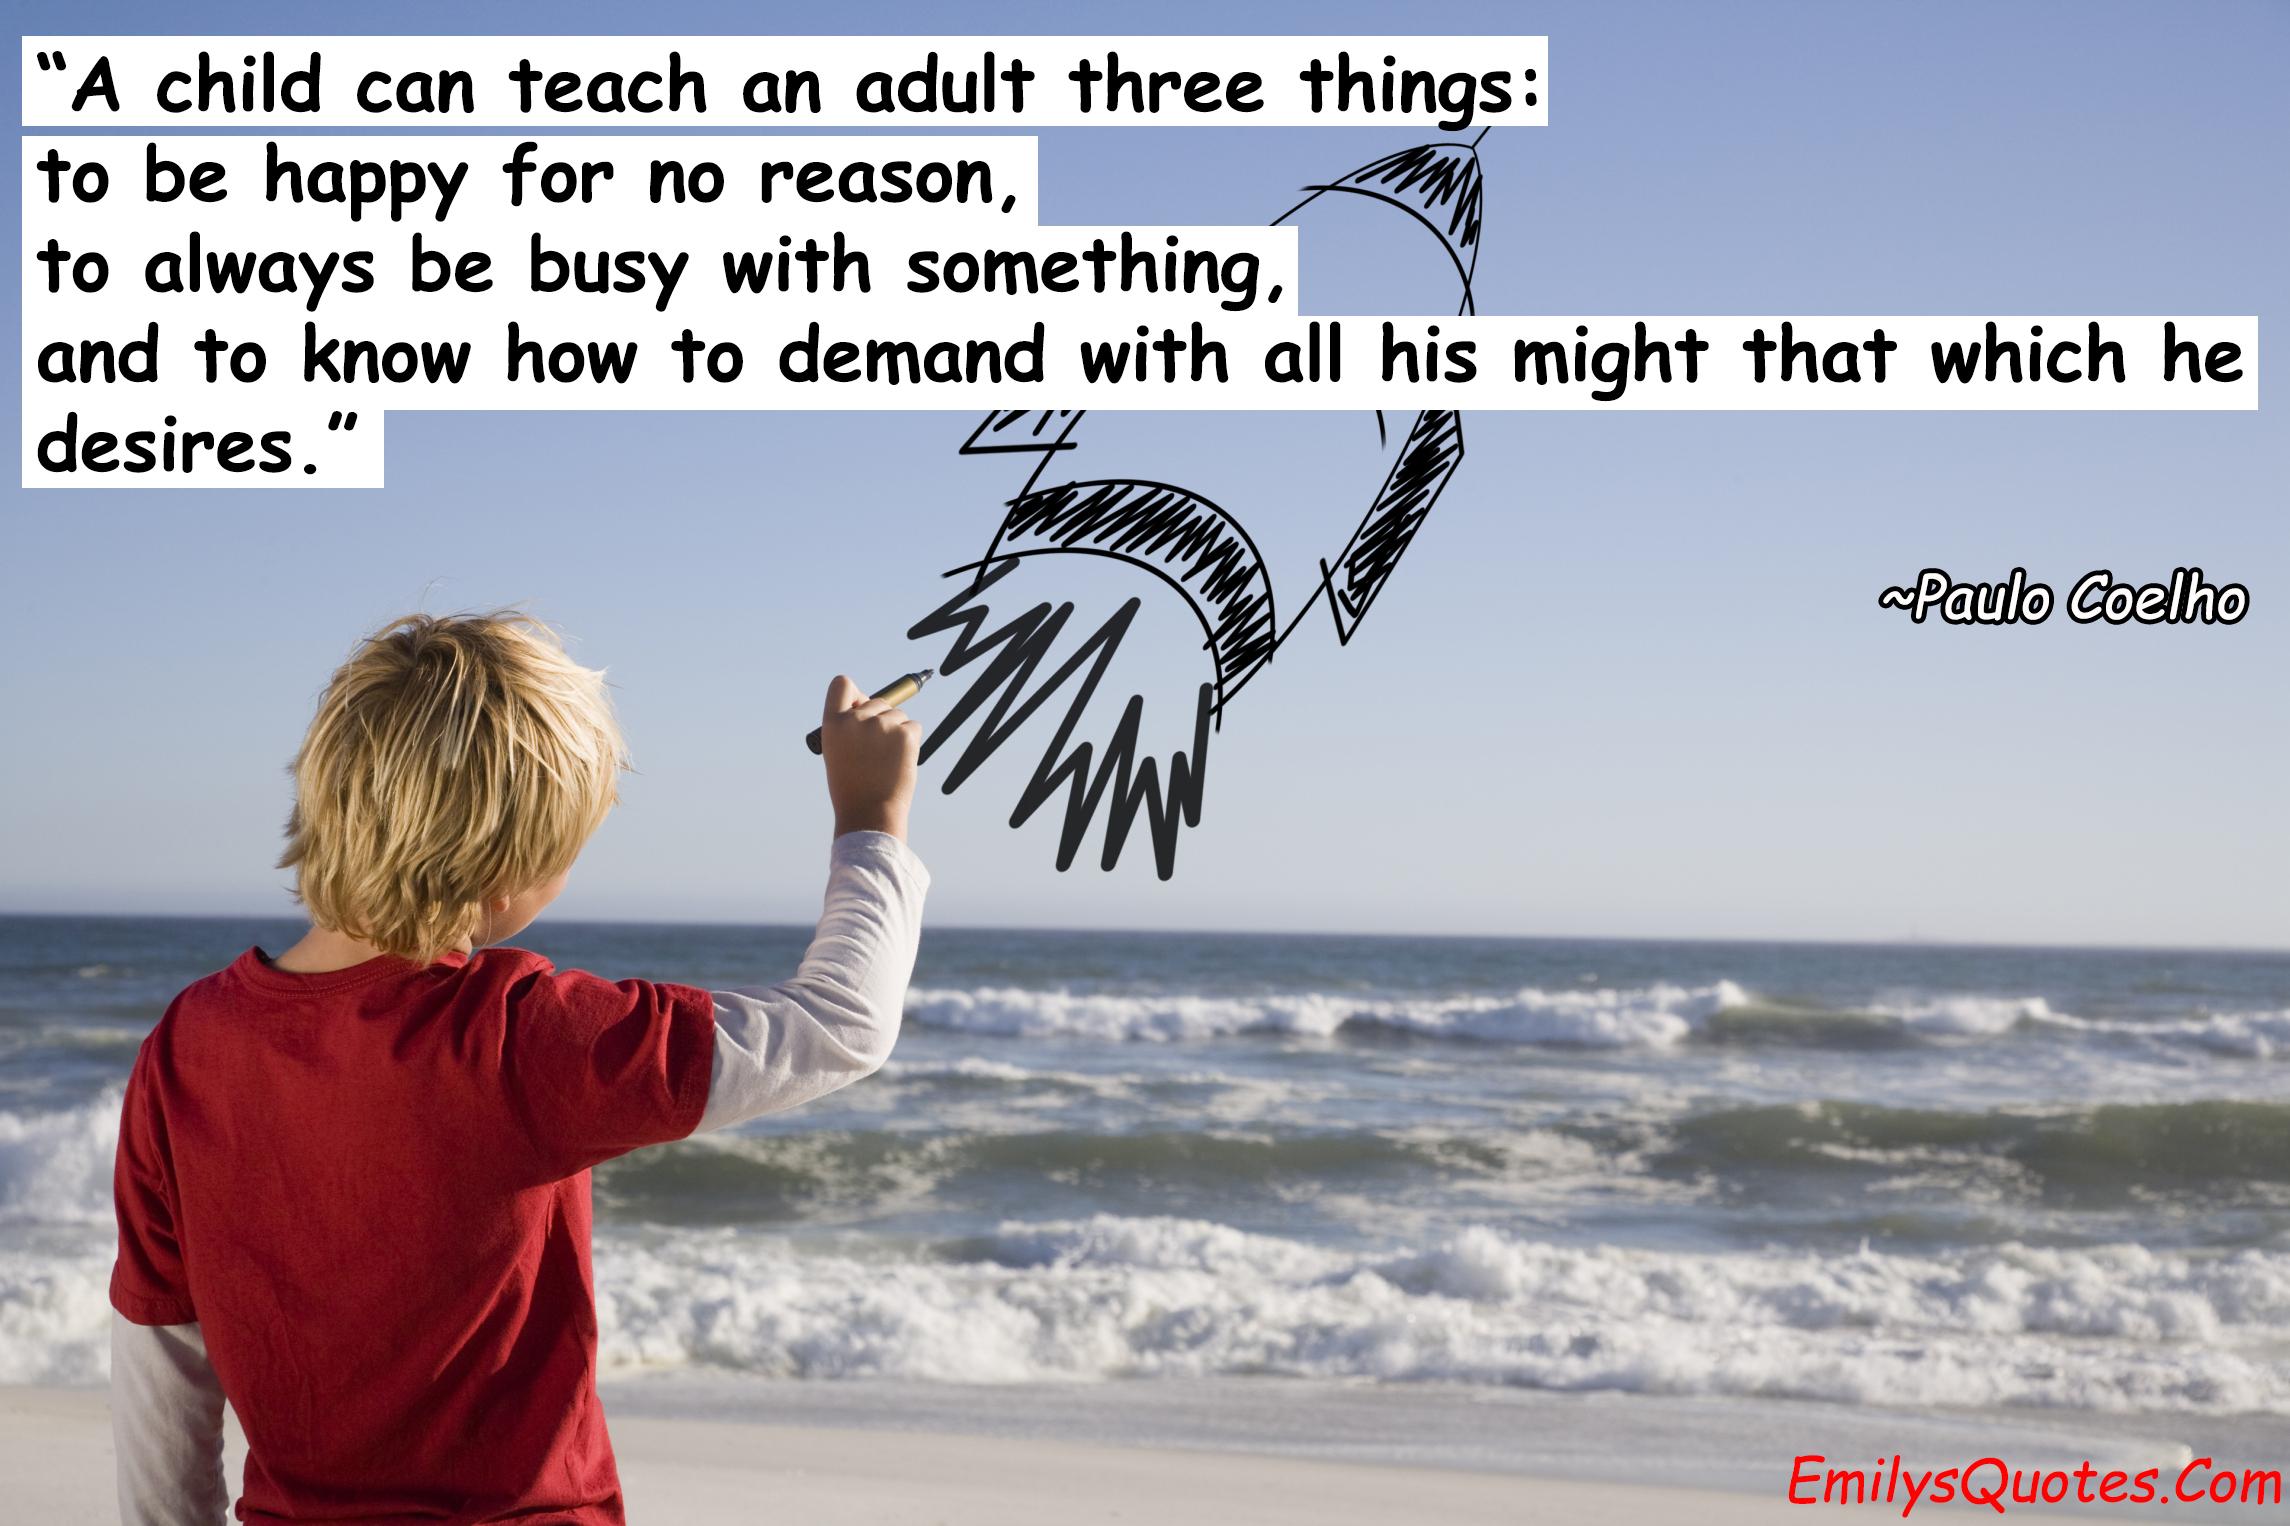 EmilysQuotes.Com-amazing-great-child-teach-happy-Paulo-Coelho.jpg